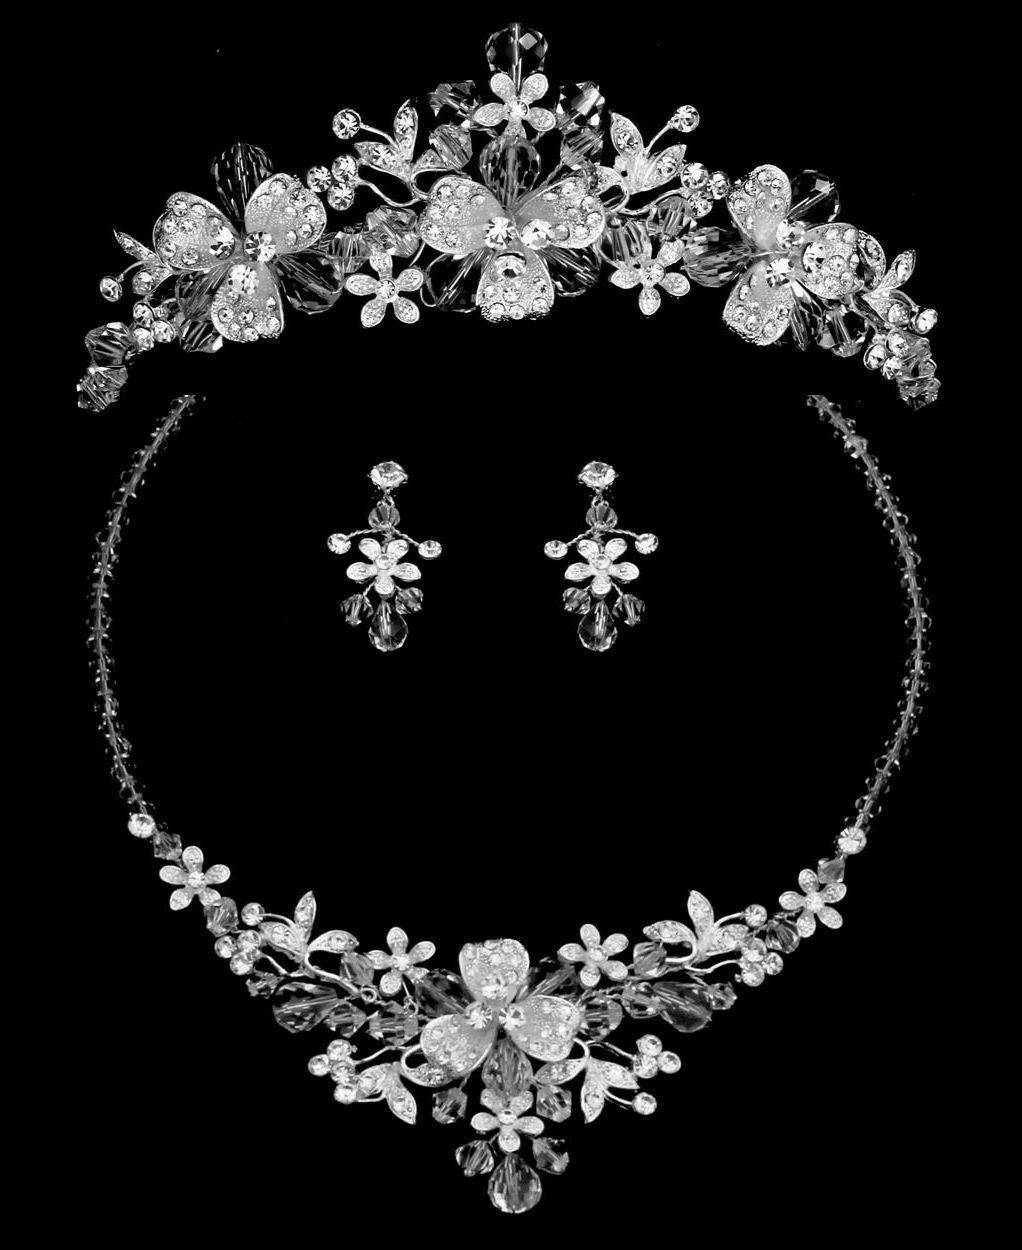 Silver Rhinestone Crystal Flower Bridal Tiara Wedding Necklace Jewelry Set